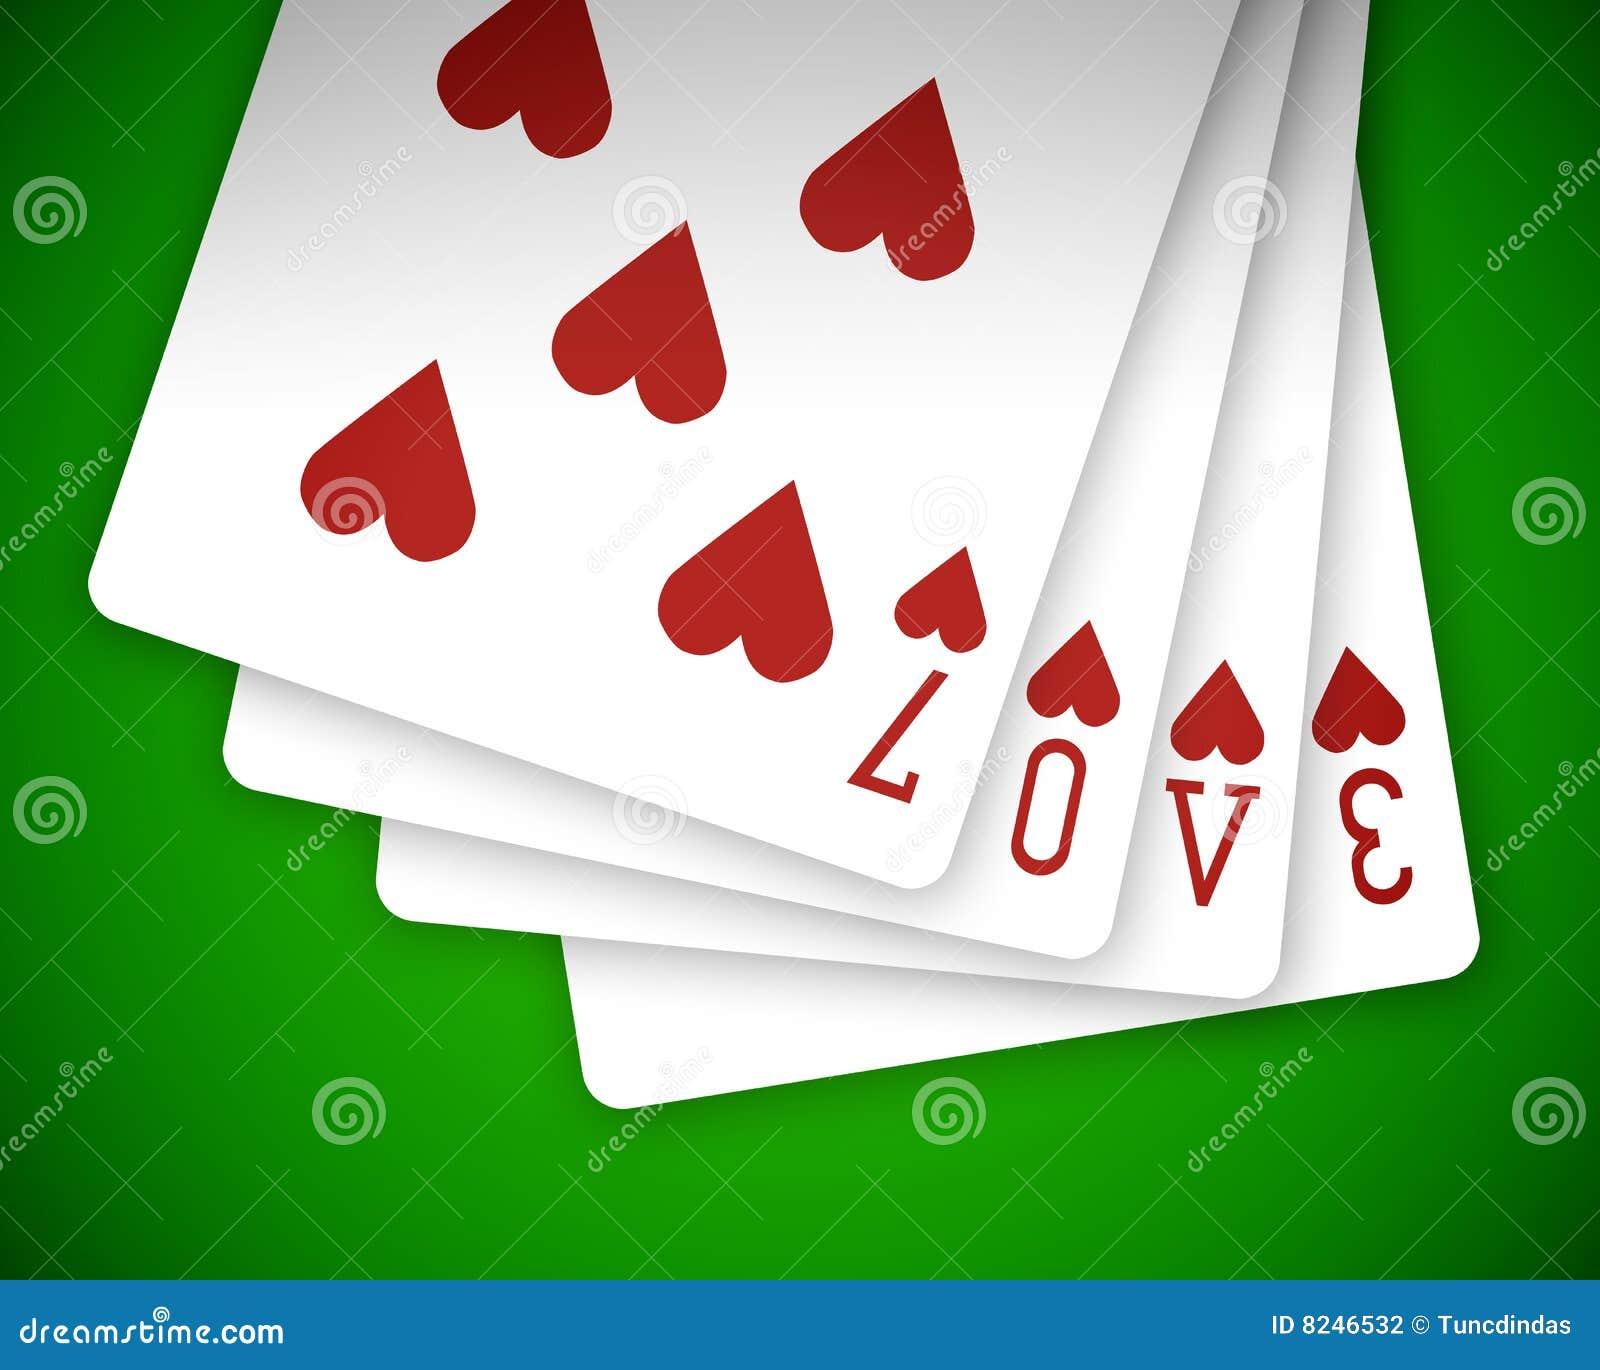 Poker nam le